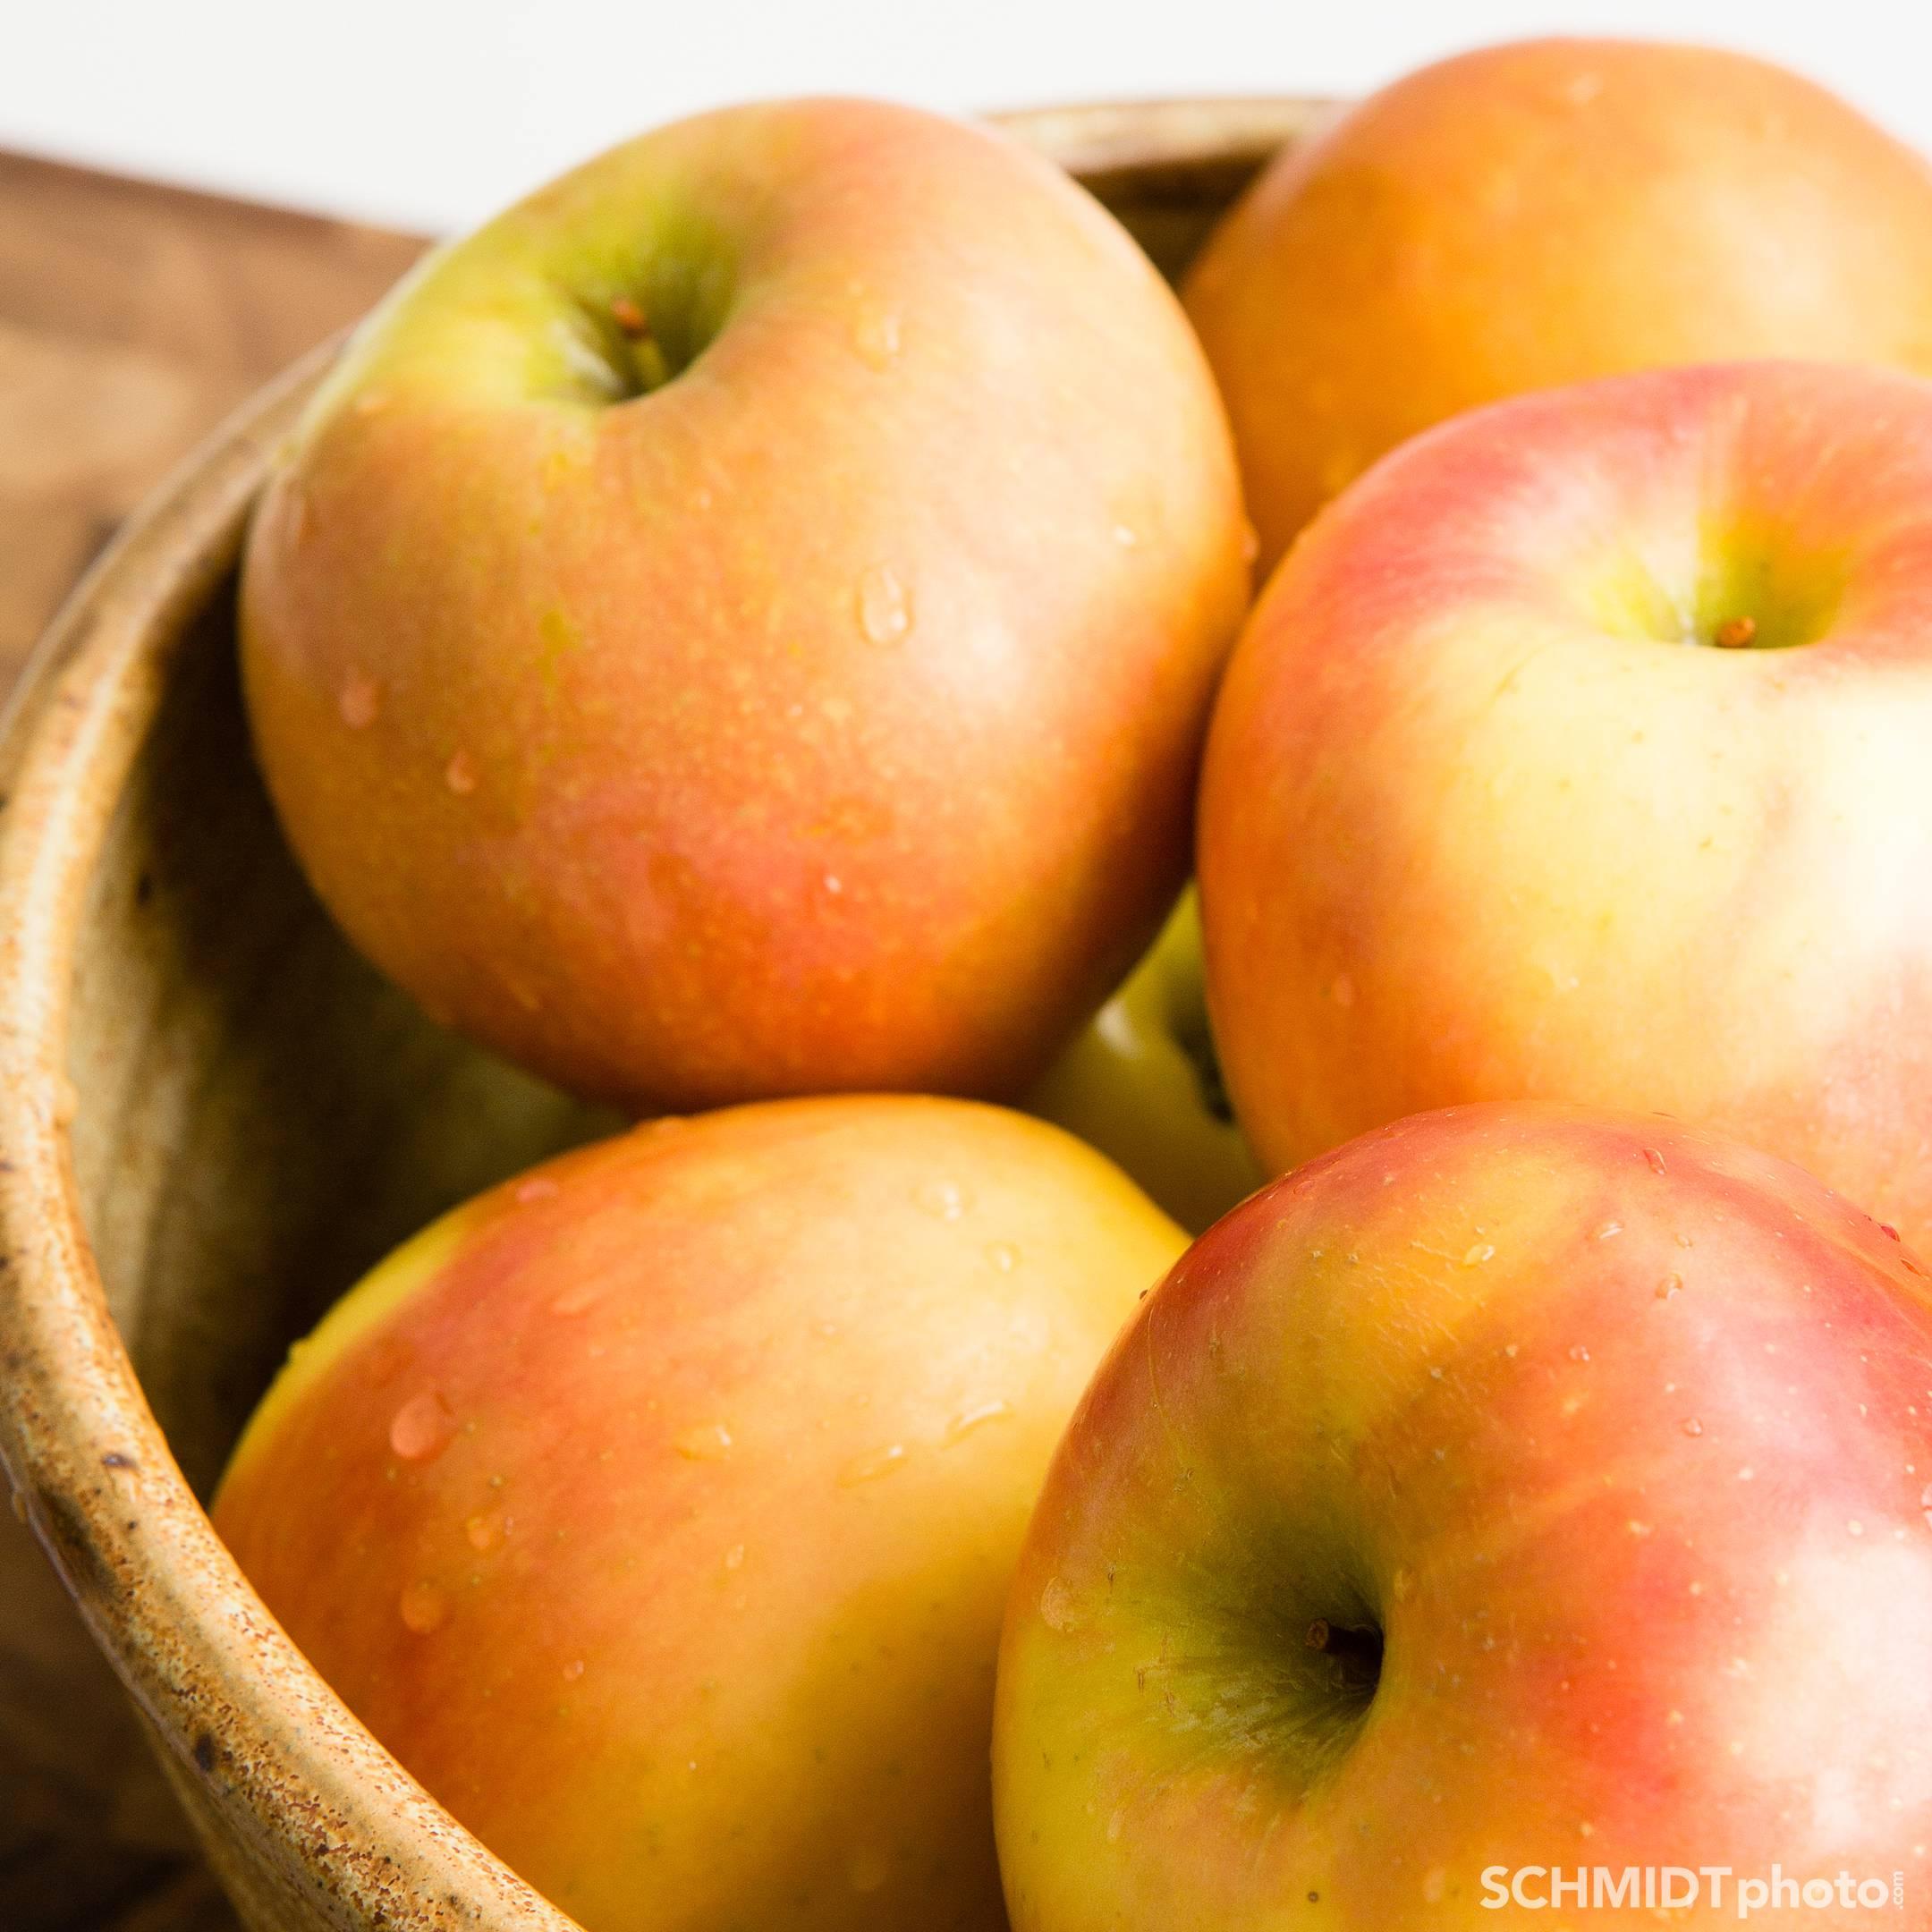 applesauce-homemade-easy-eat-with-tom-foodblog-schmidt-photo_2111